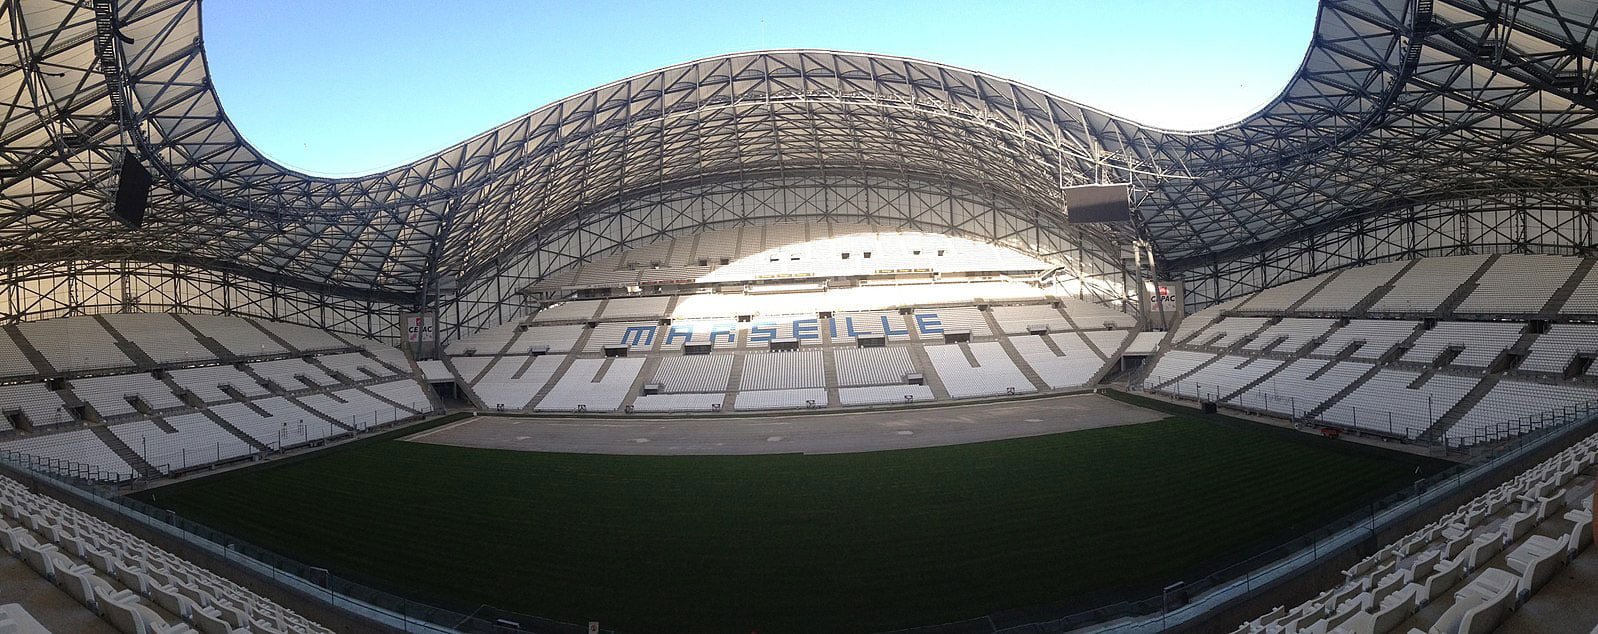 The Velodrome stadium, Marseille